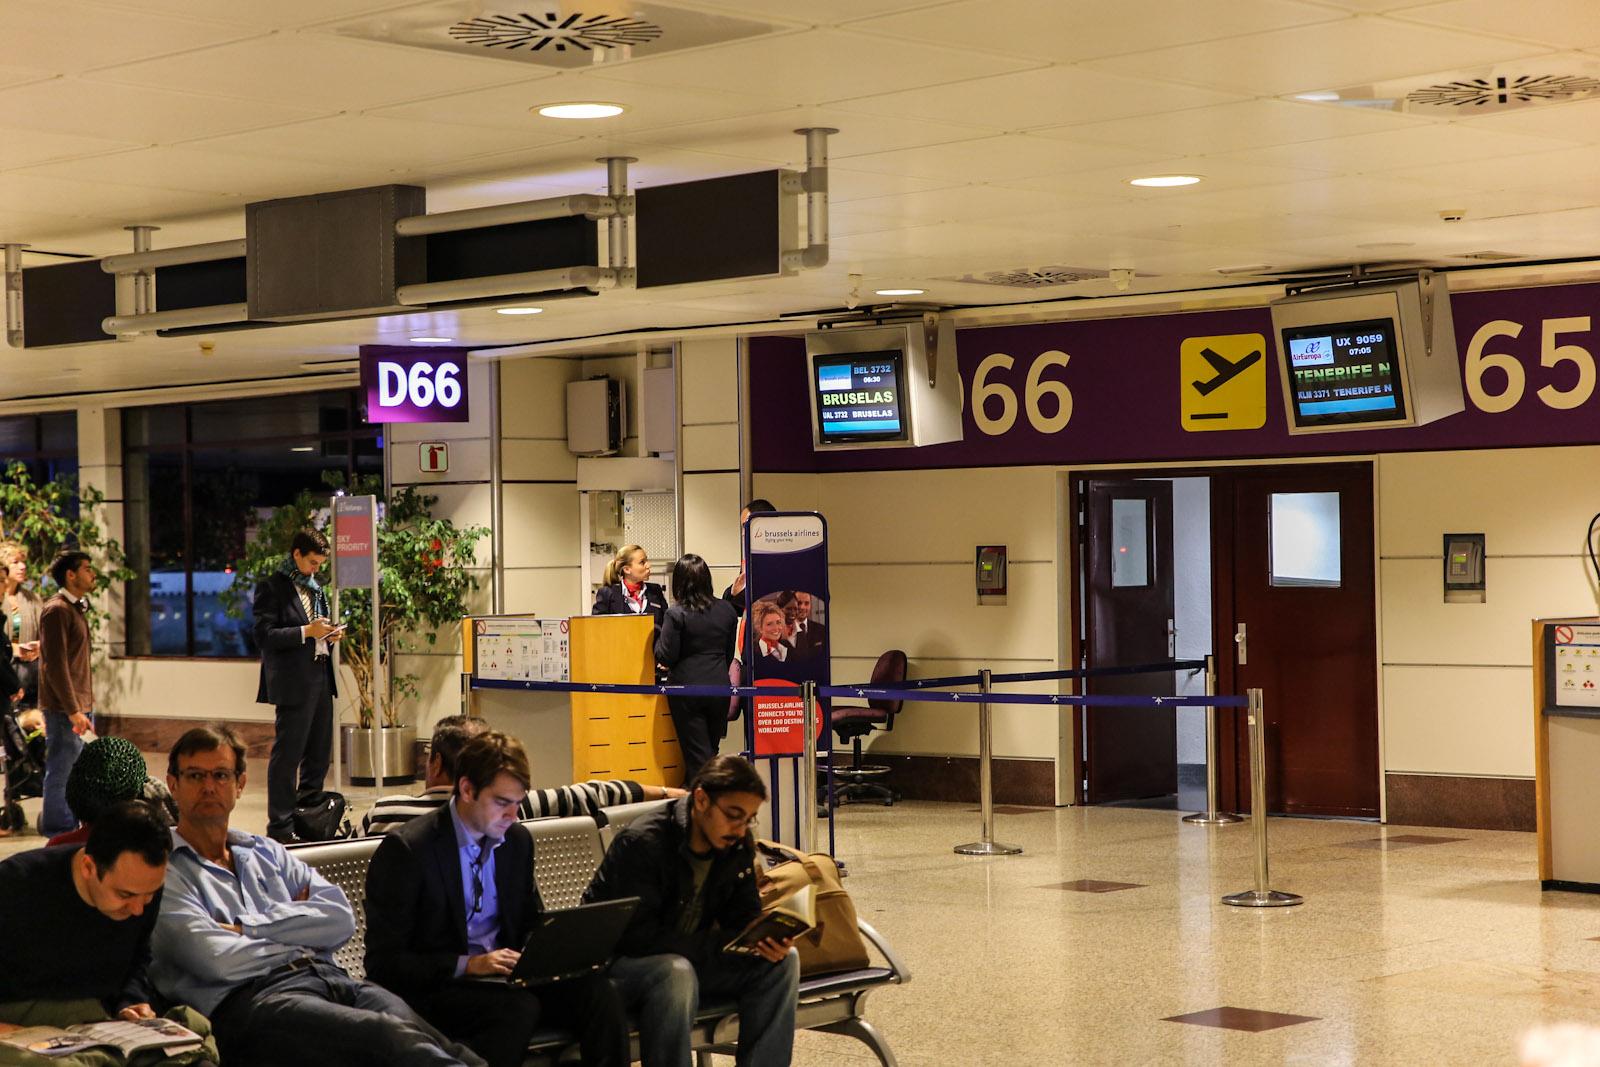 Выход на посадку в терминале Т2 аэропорта Мадрид Барахас